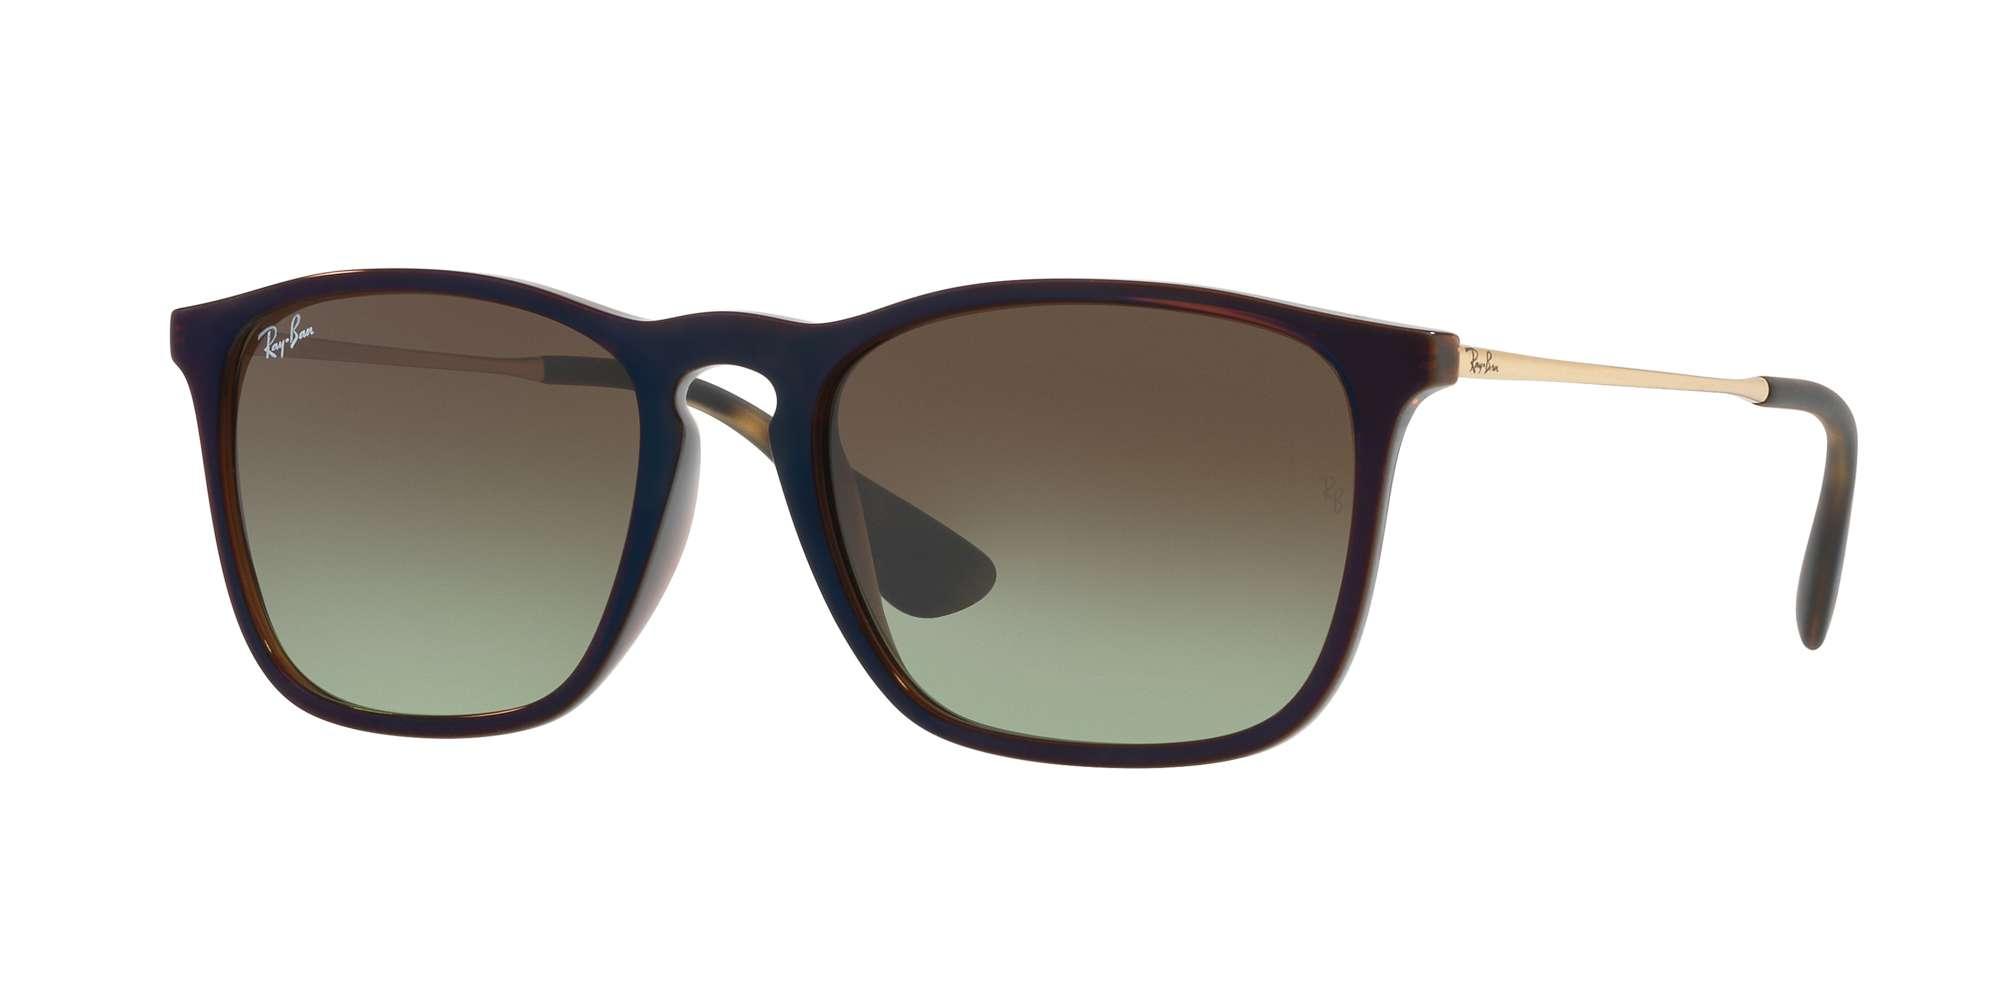 TRASPARENT BROWN SP BLU / GREEN GRADIENT BROWN lenses